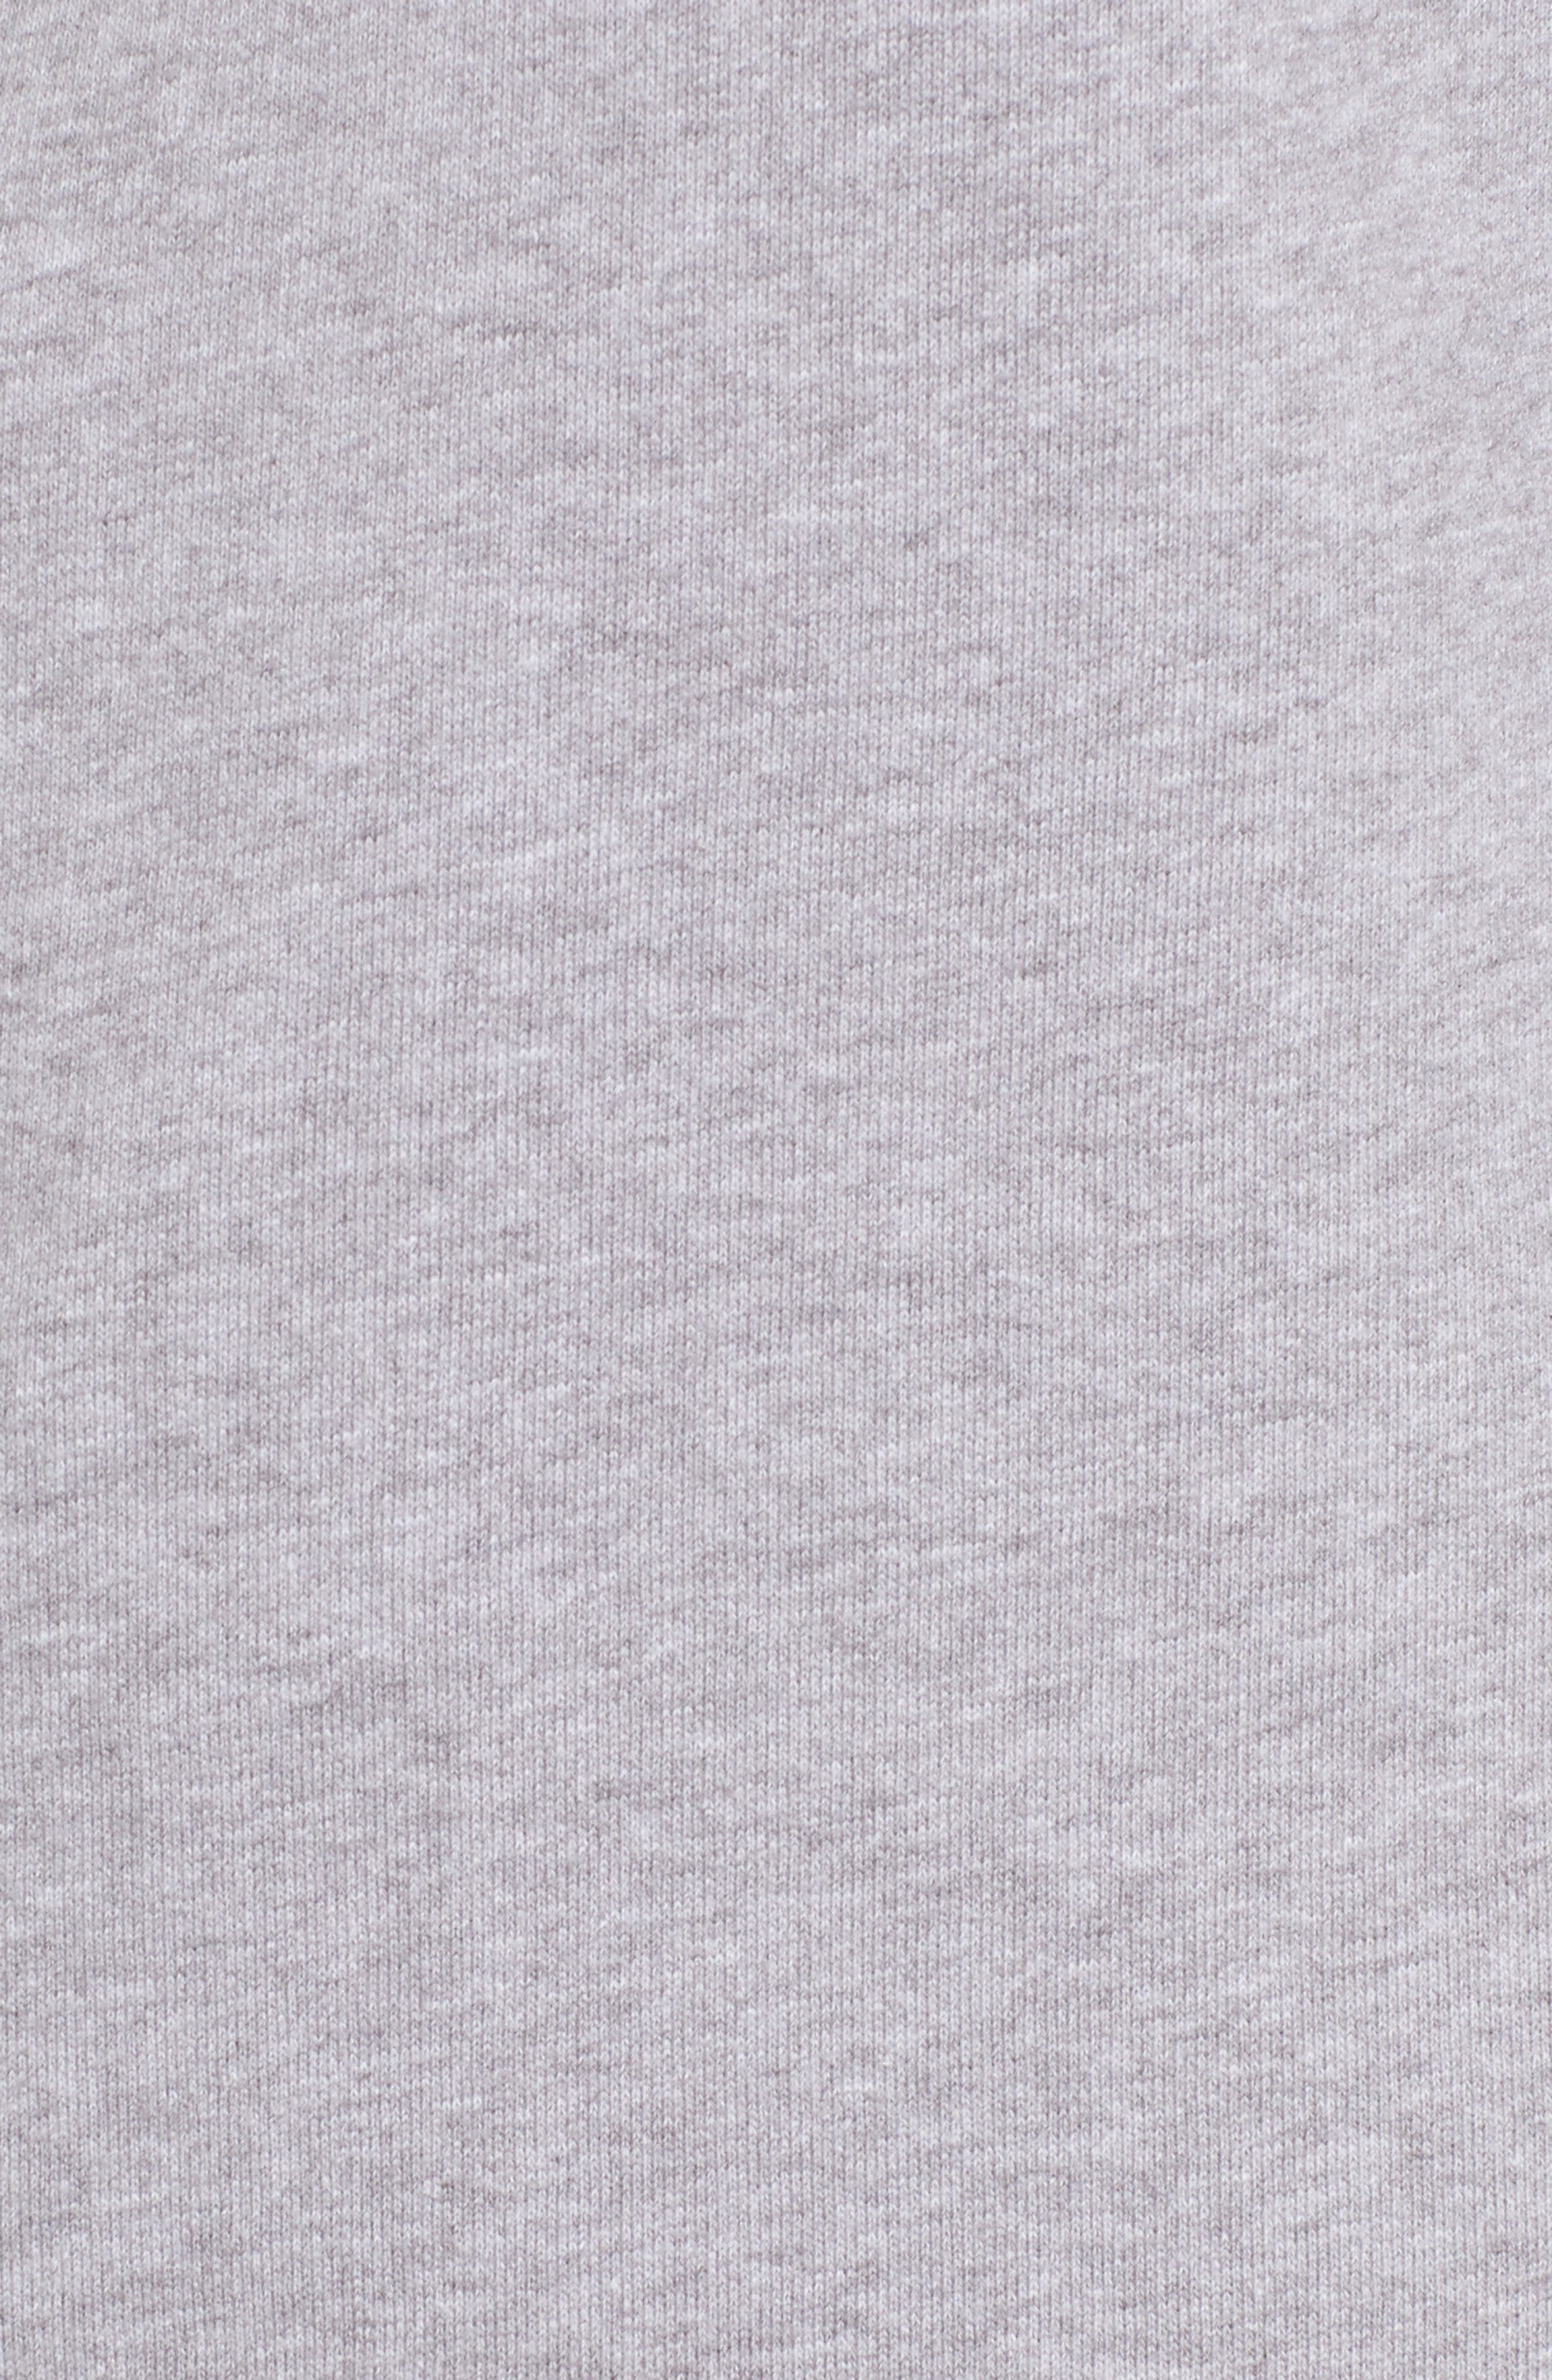 Tear Cutoff Sweatshirt,                             Alternate thumbnail 5, color,                             020